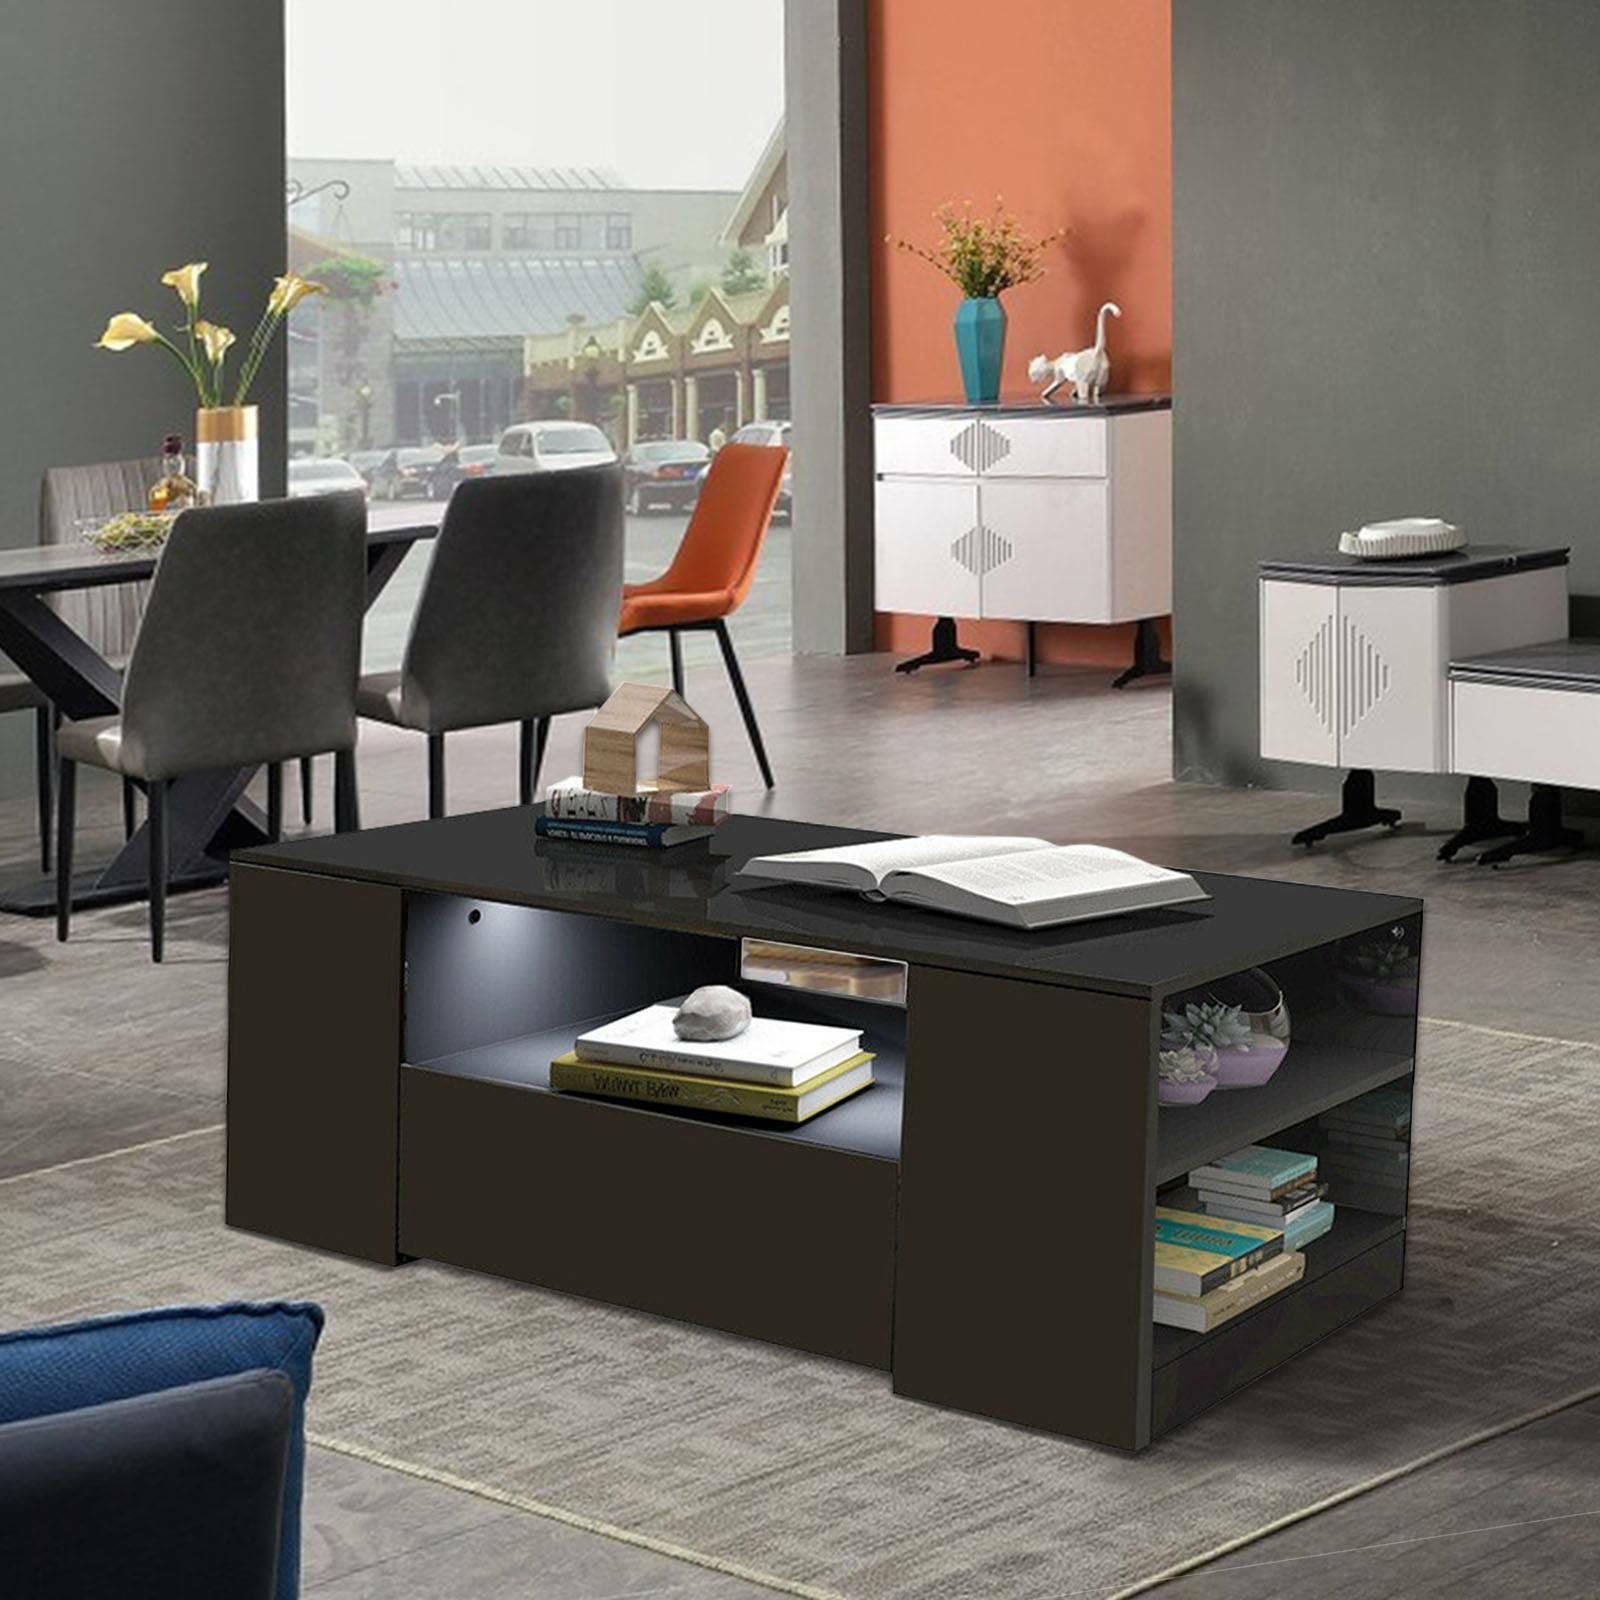 High Gloss White Adjustable Swivel Modern Coffee Table Living Room Furniture For Sale Ebay